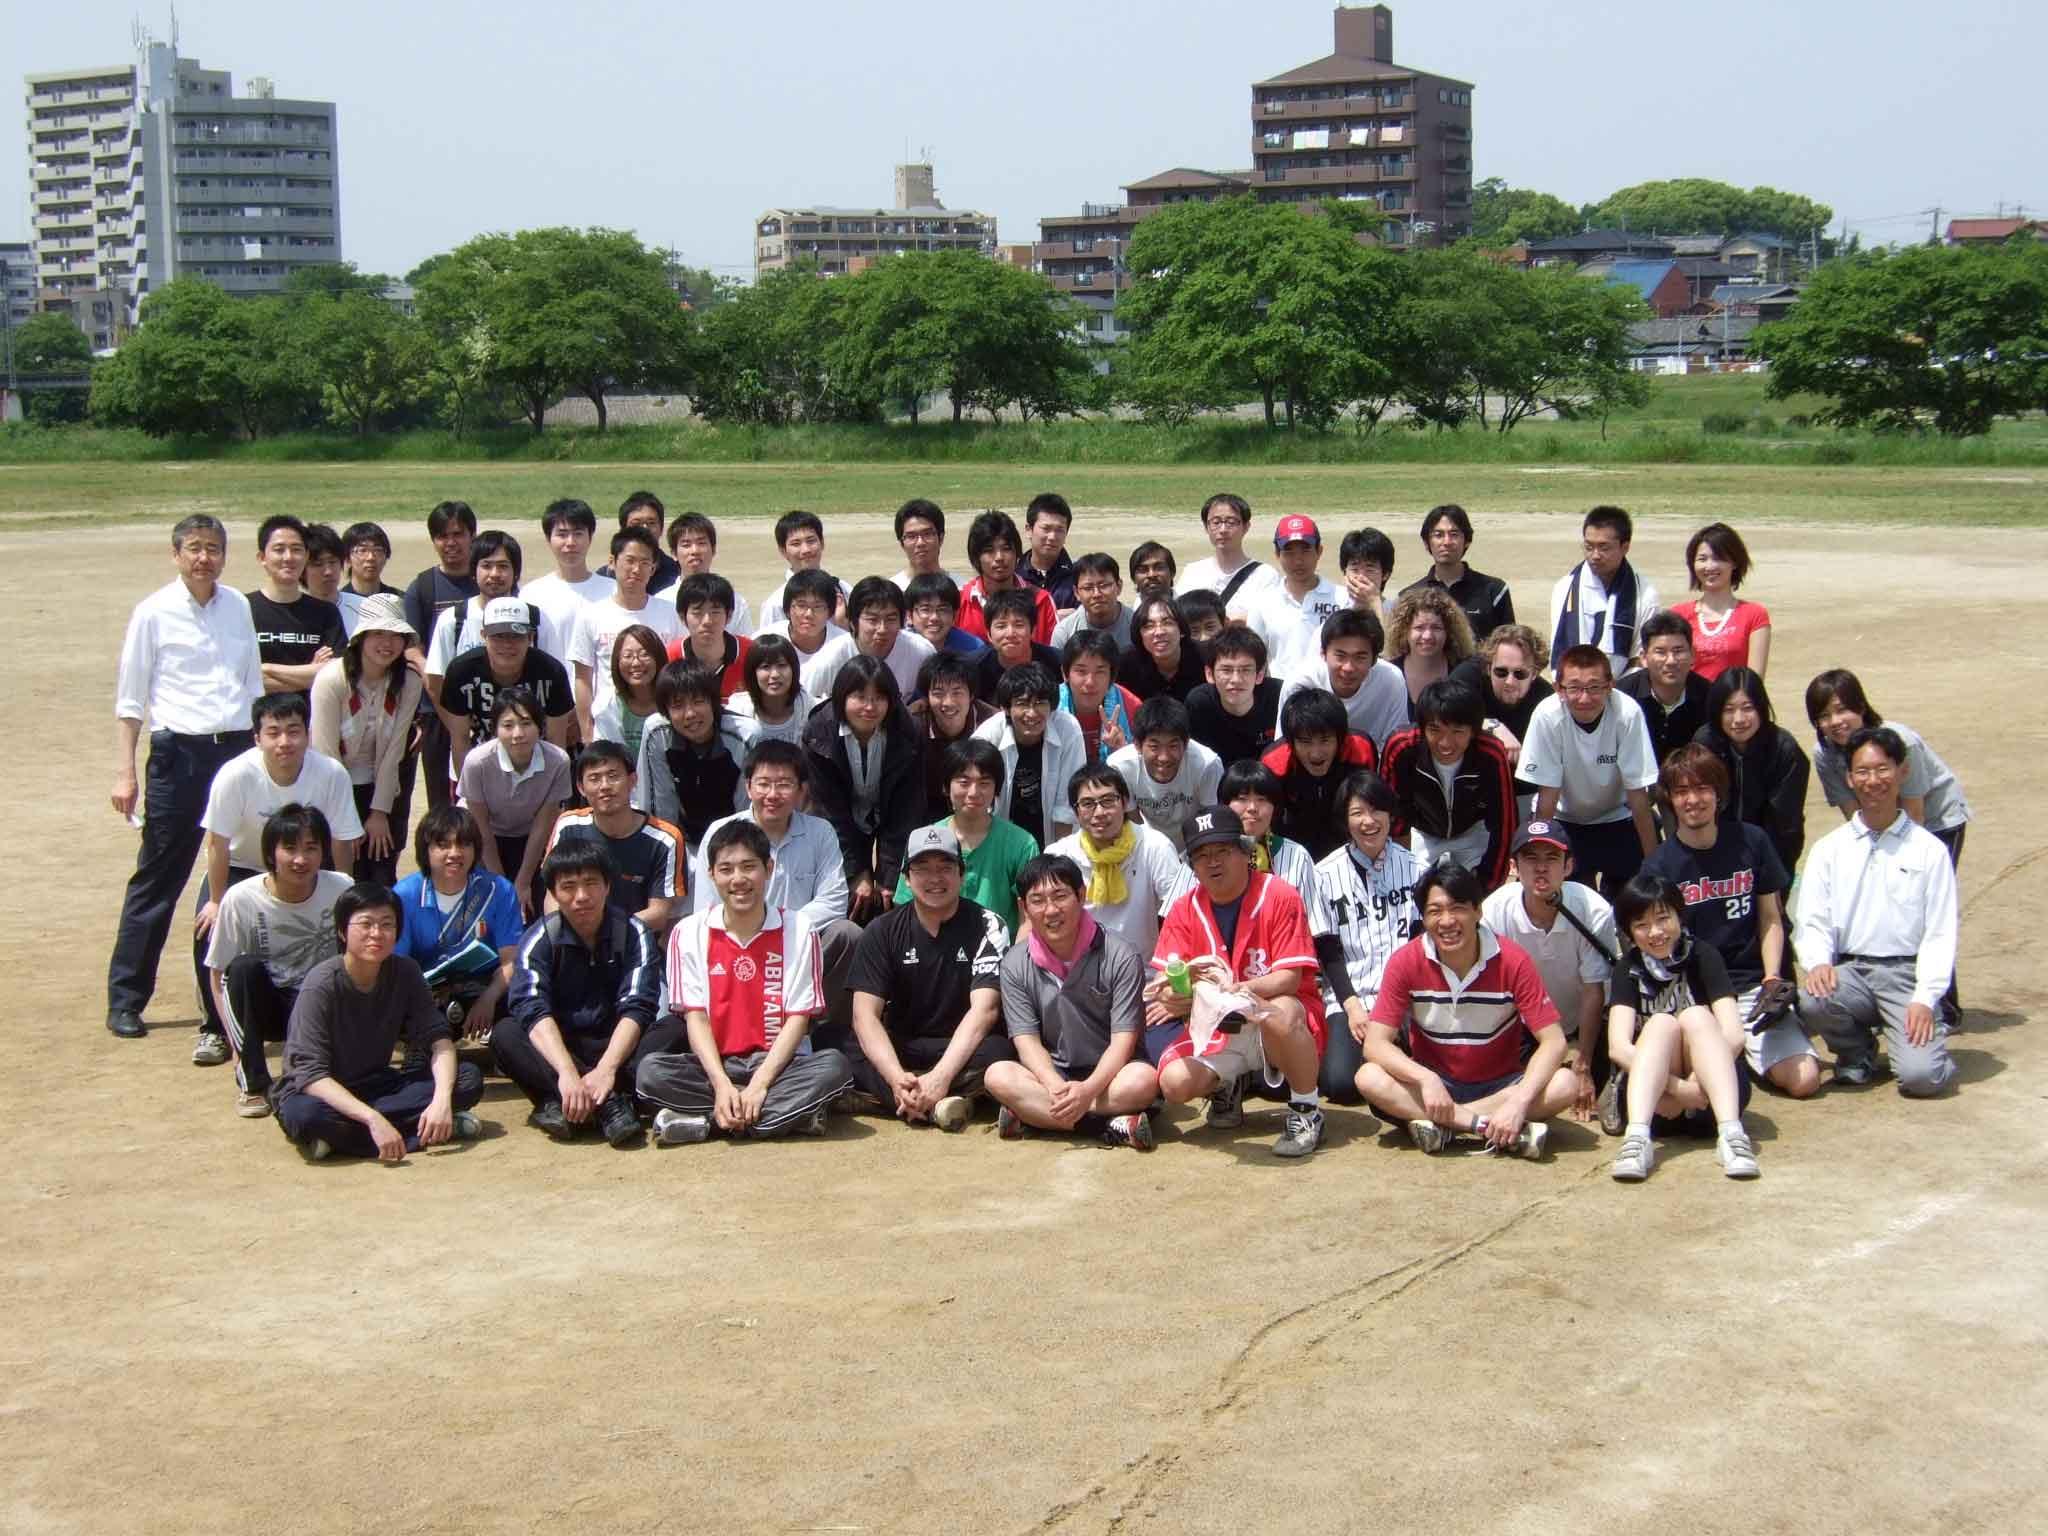 http://synth.chem.nagoya-u.ac.jp/wordpress/wp-content/uploads/2008/05/20080507_01.jpg